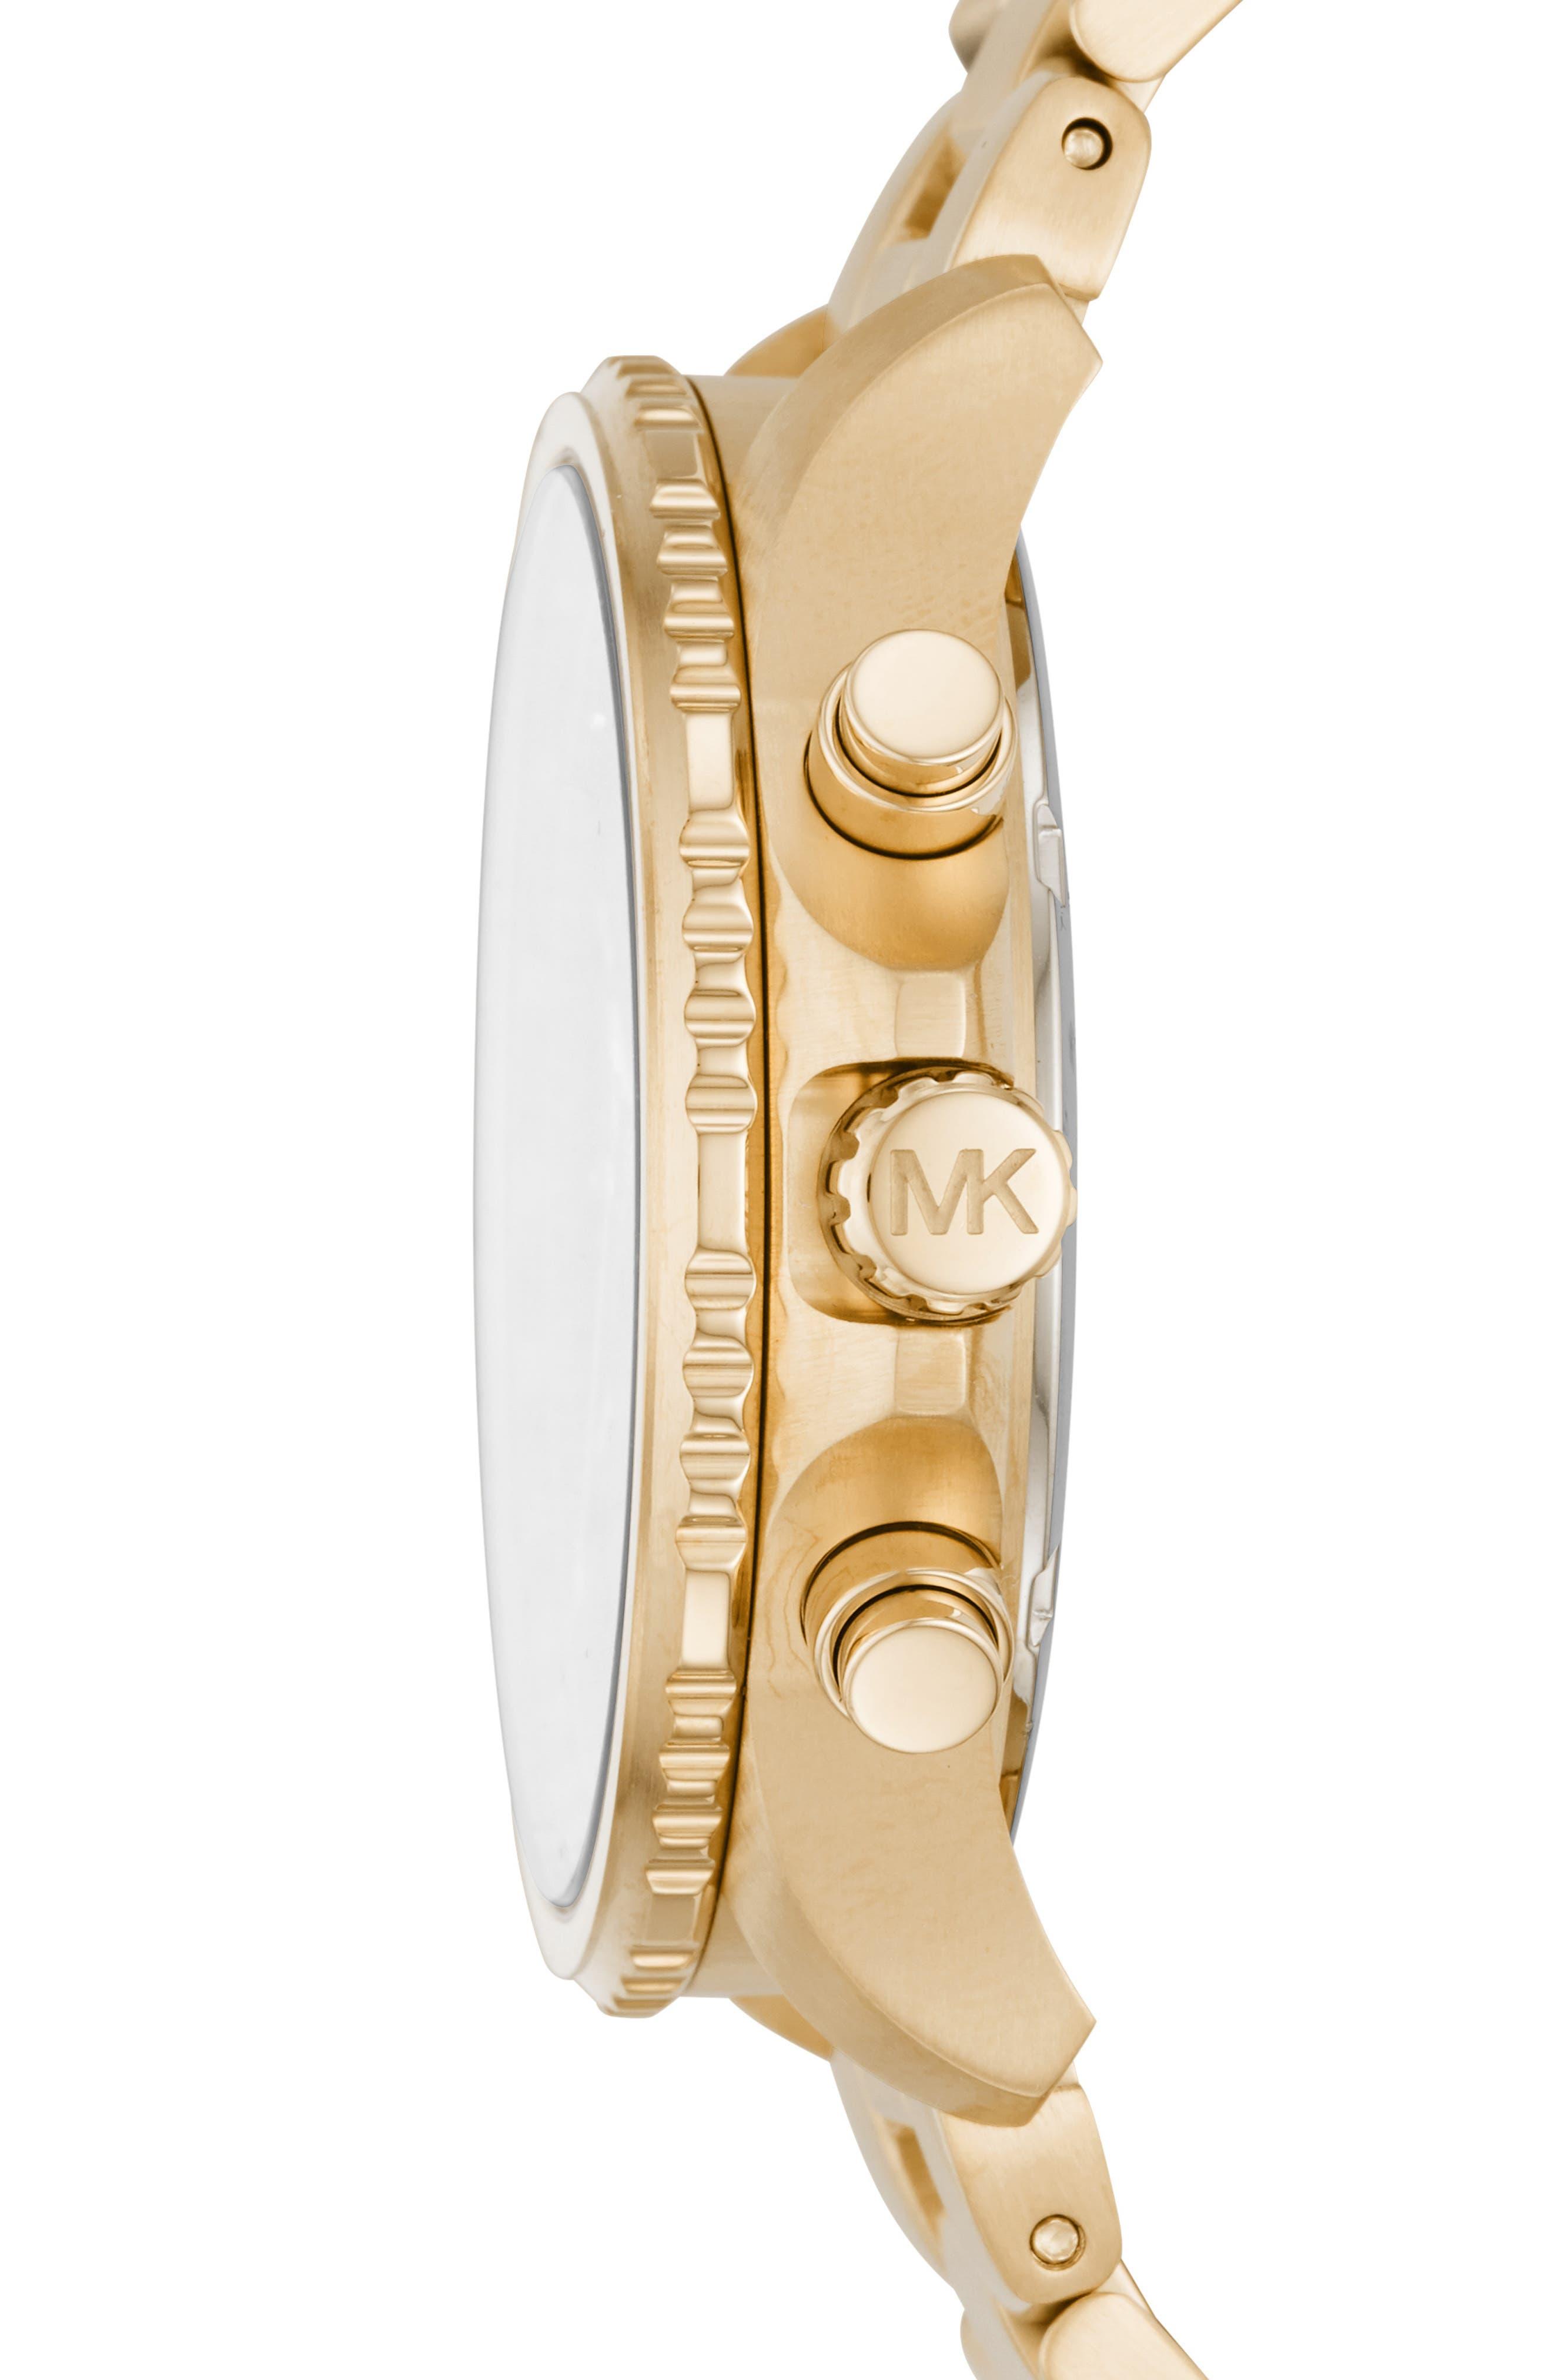 MICHAEL KORS, Theroux Bracelet Watch, 42mm, Alternate thumbnail 2, color, GOLD/ BLACK/ GOLD